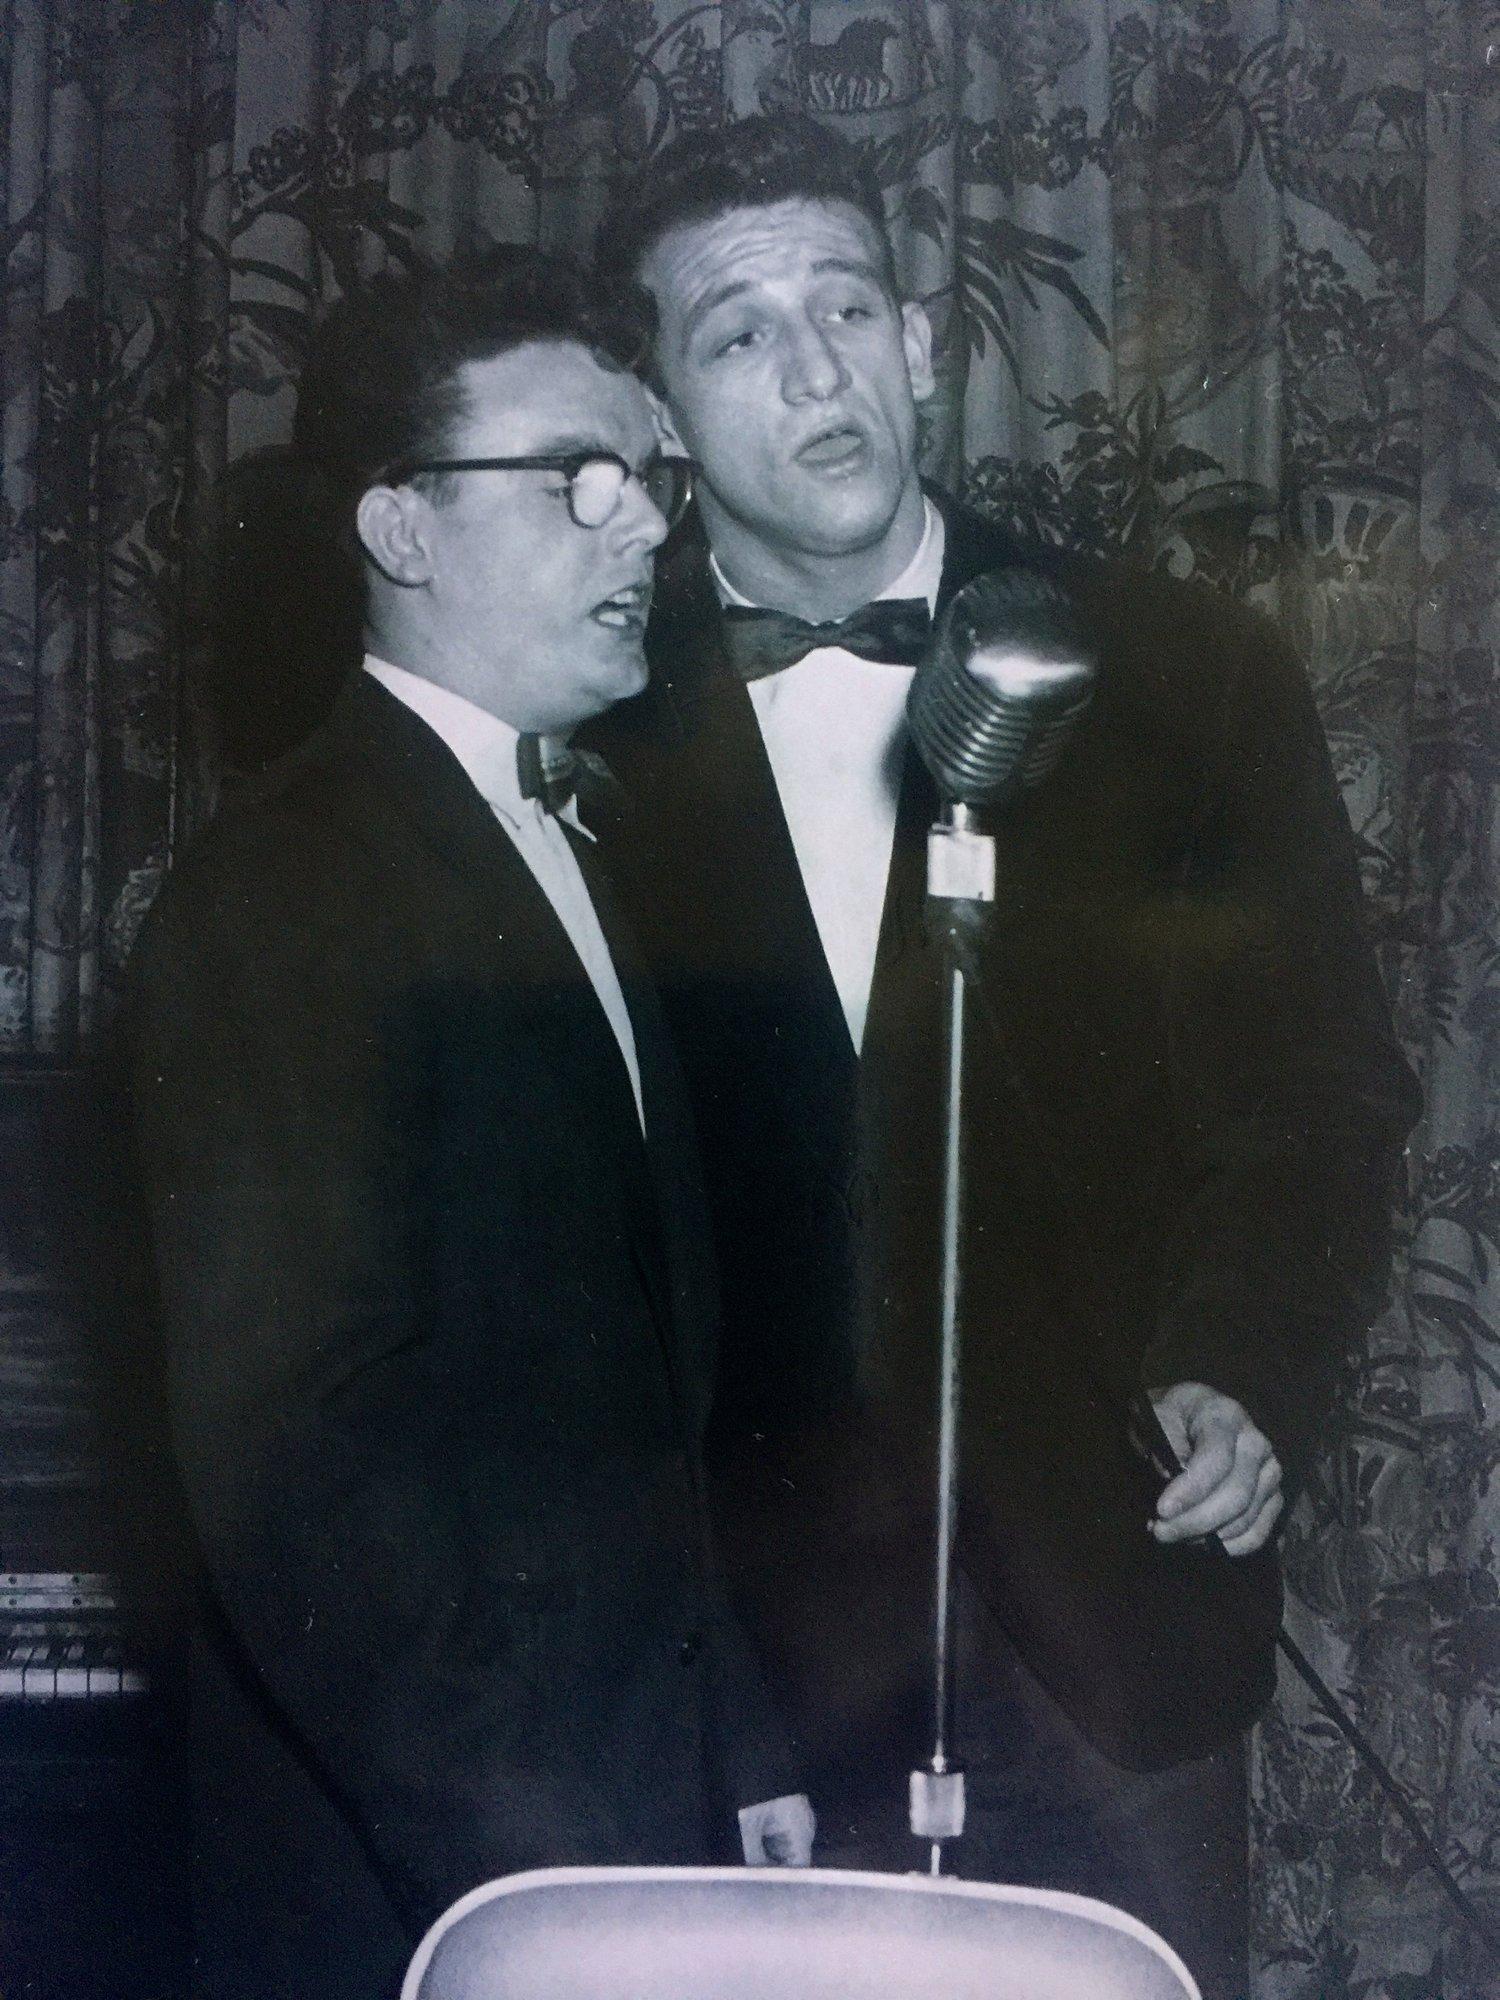 1956, Toronto